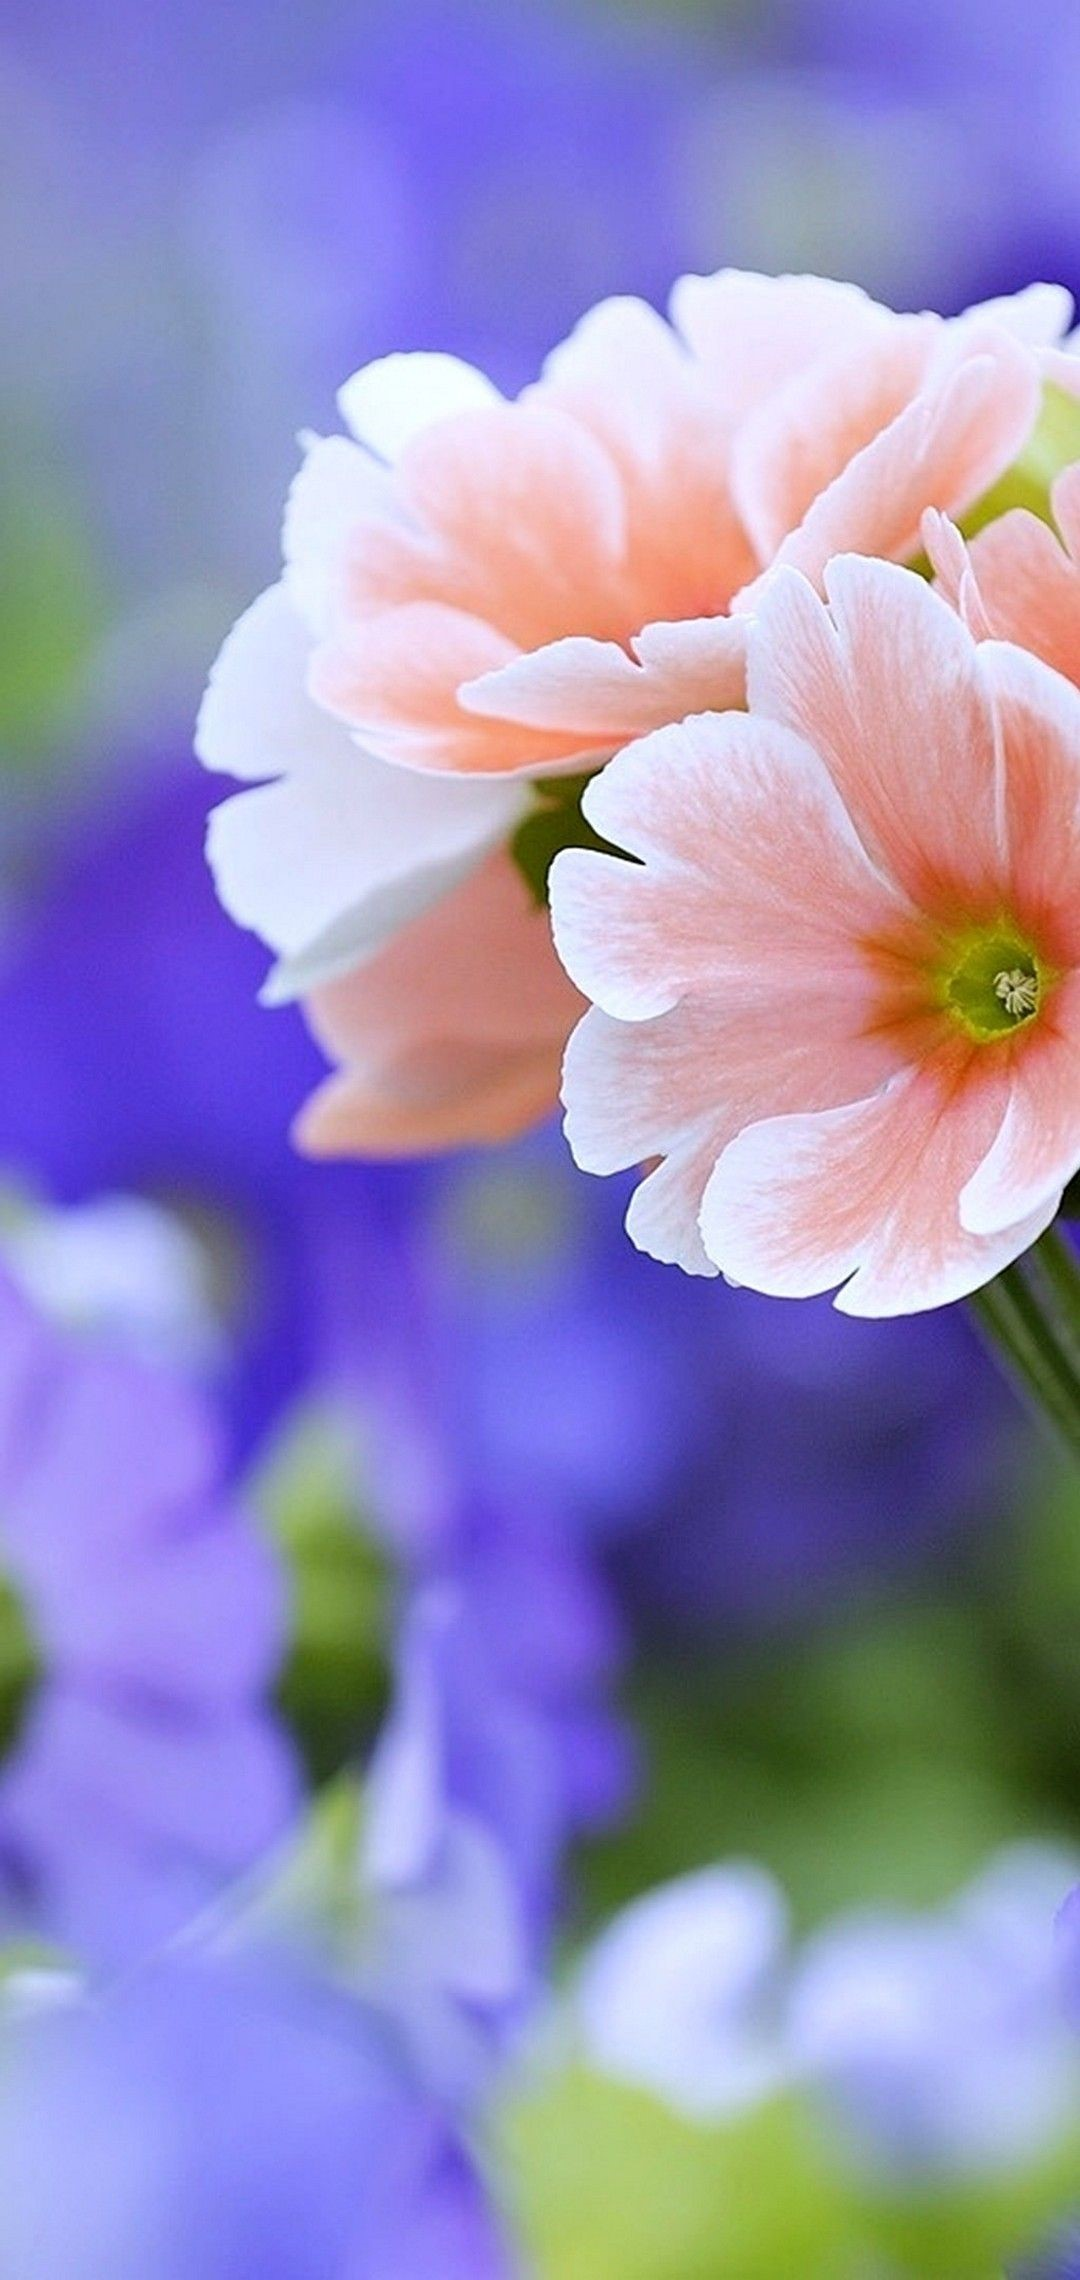 Beautiful Flower Mobile Baskground 4K